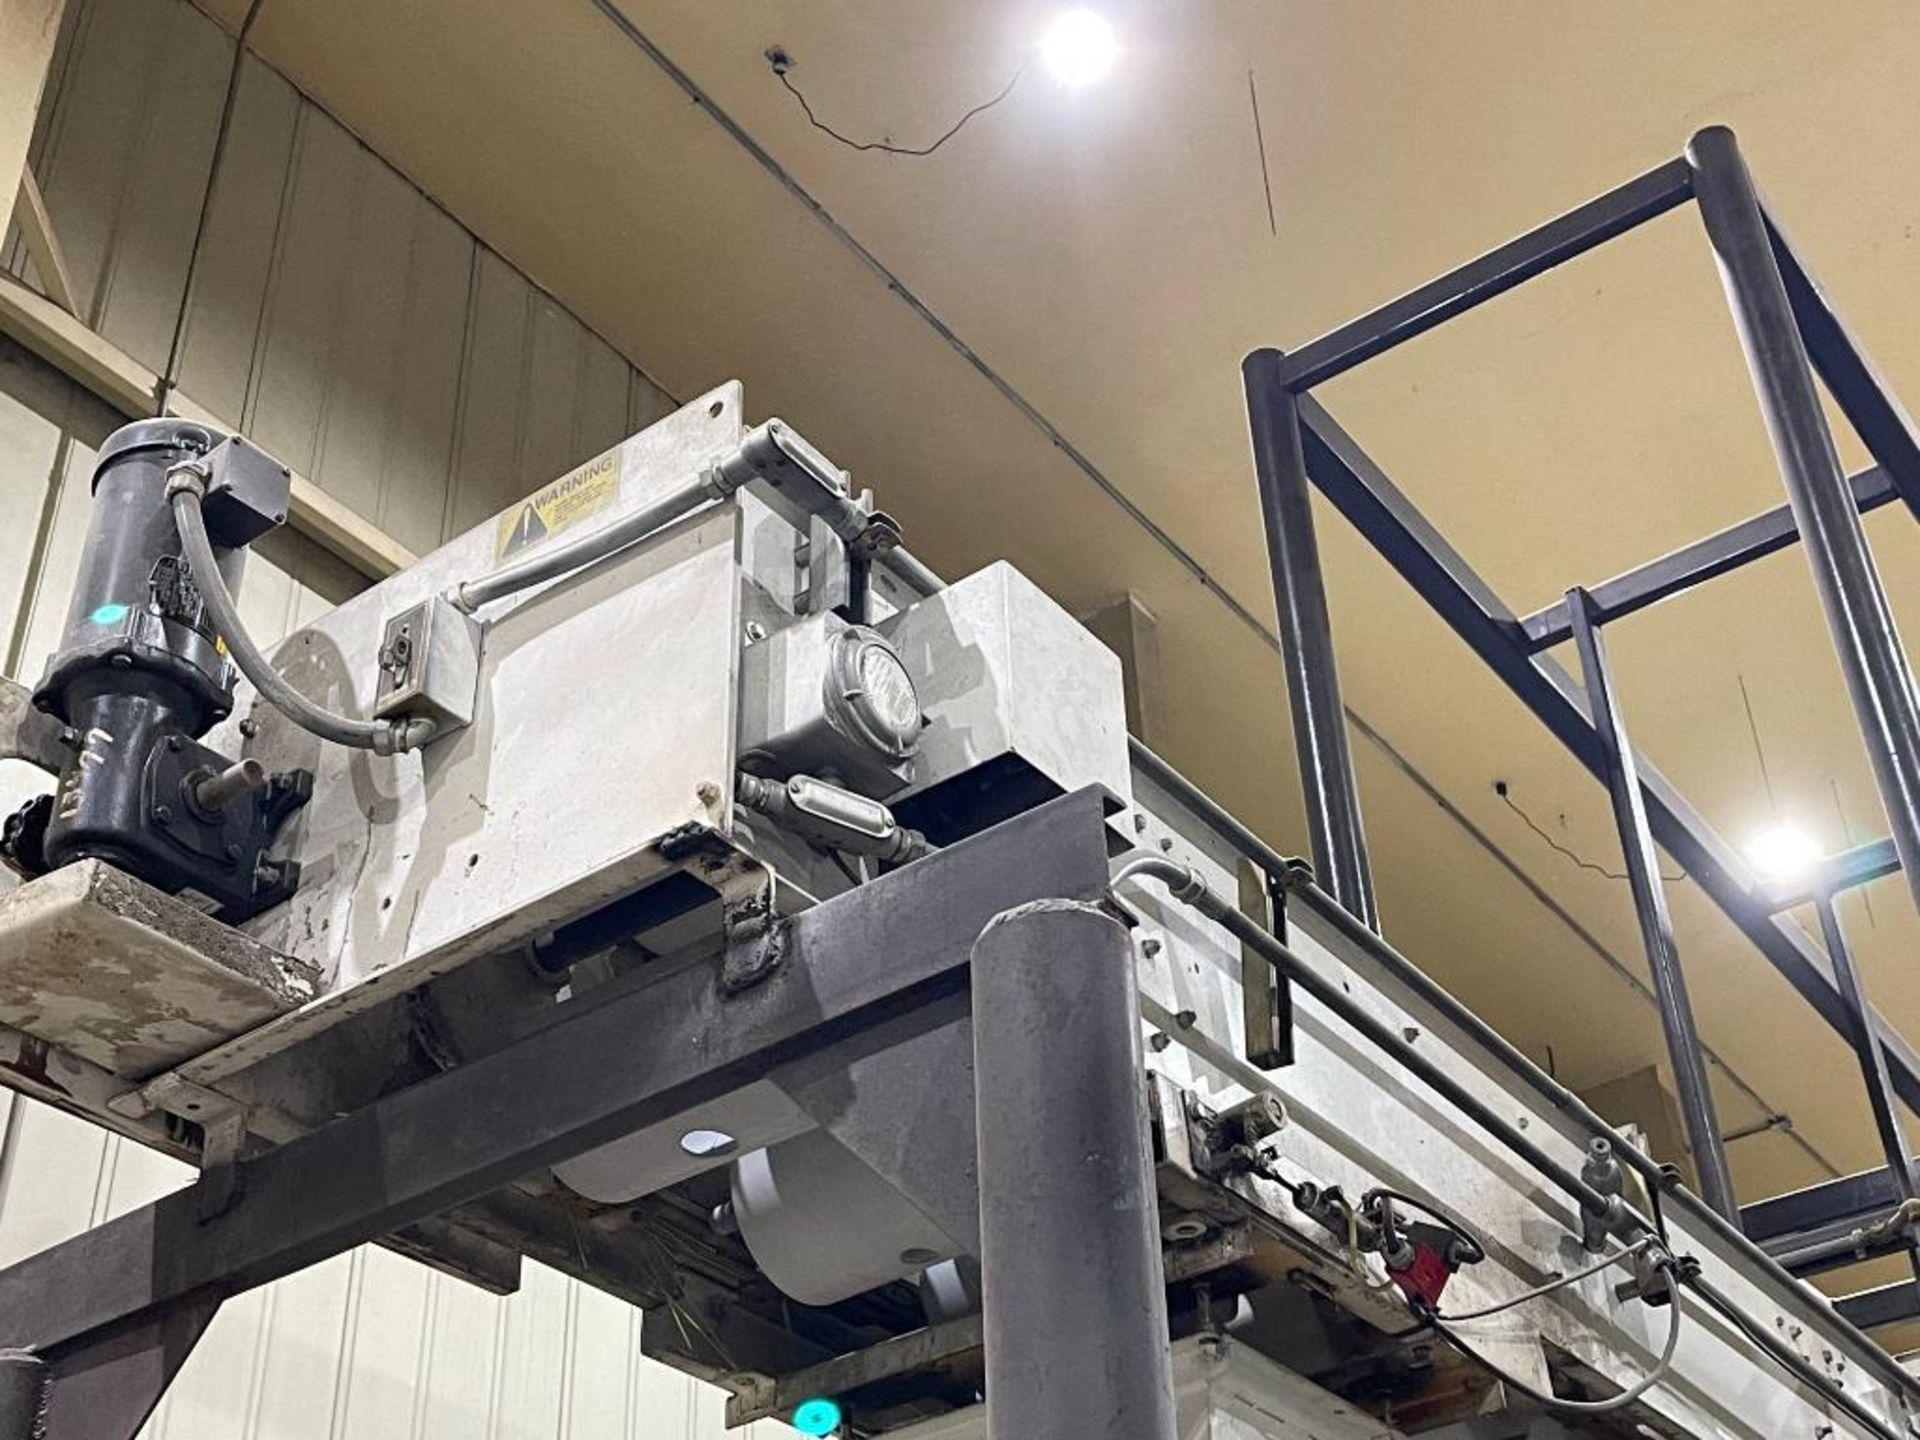 Meyer horizontal bucket elevator, model PQ-172-12-BCS - Image 14 of 19